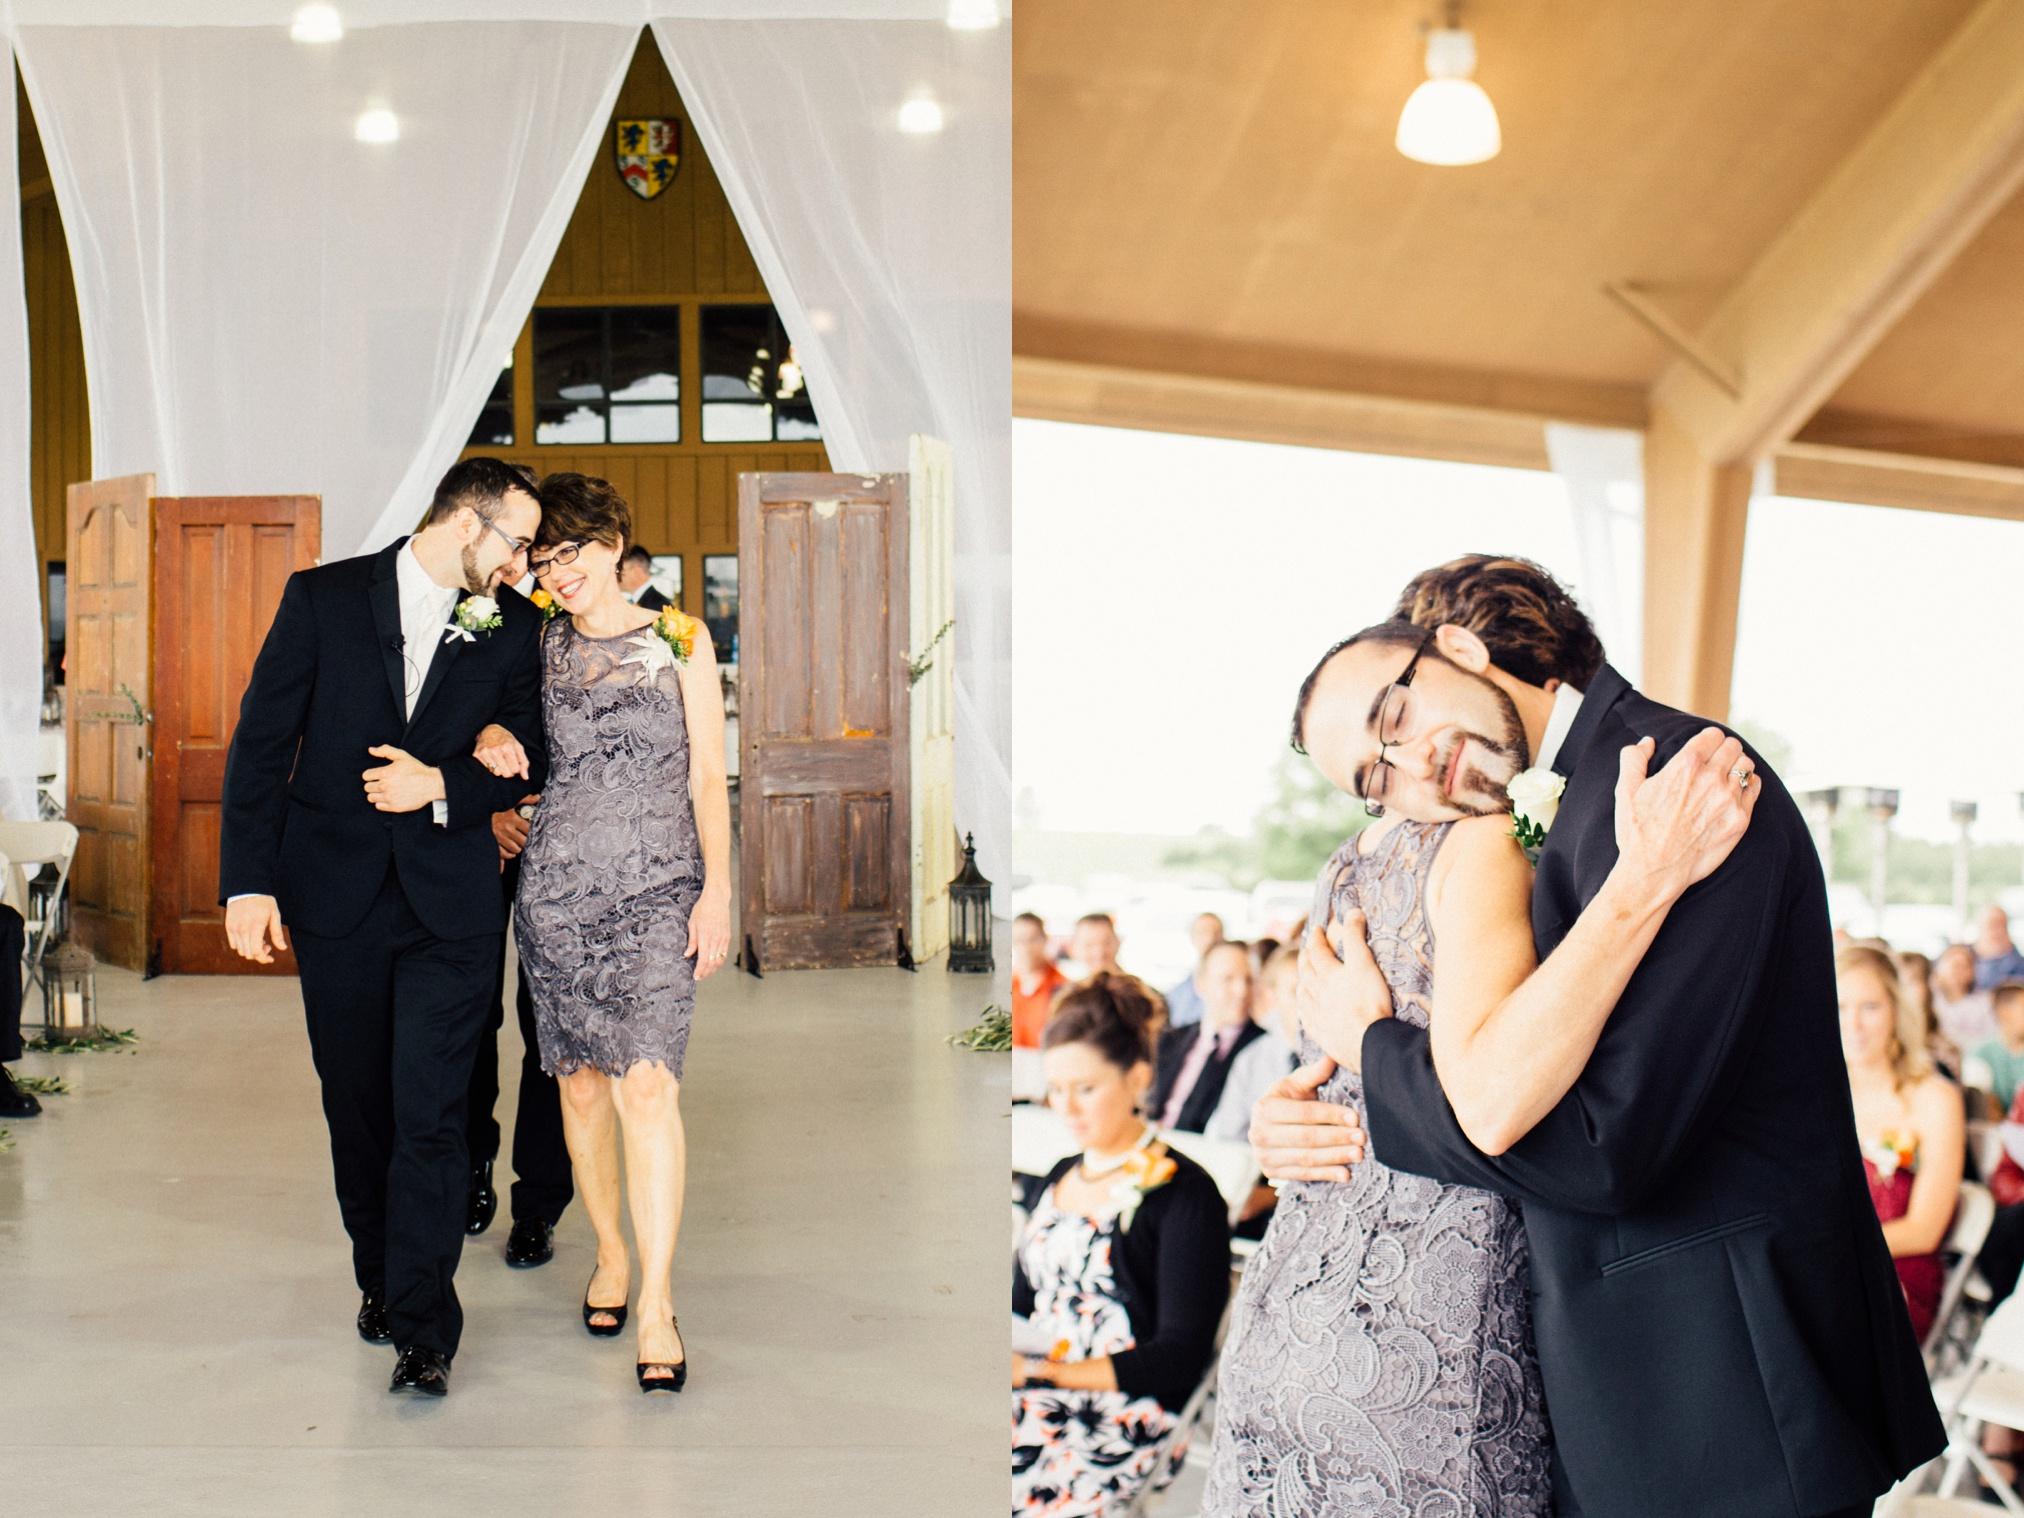 schmid_wedding-302.jpg